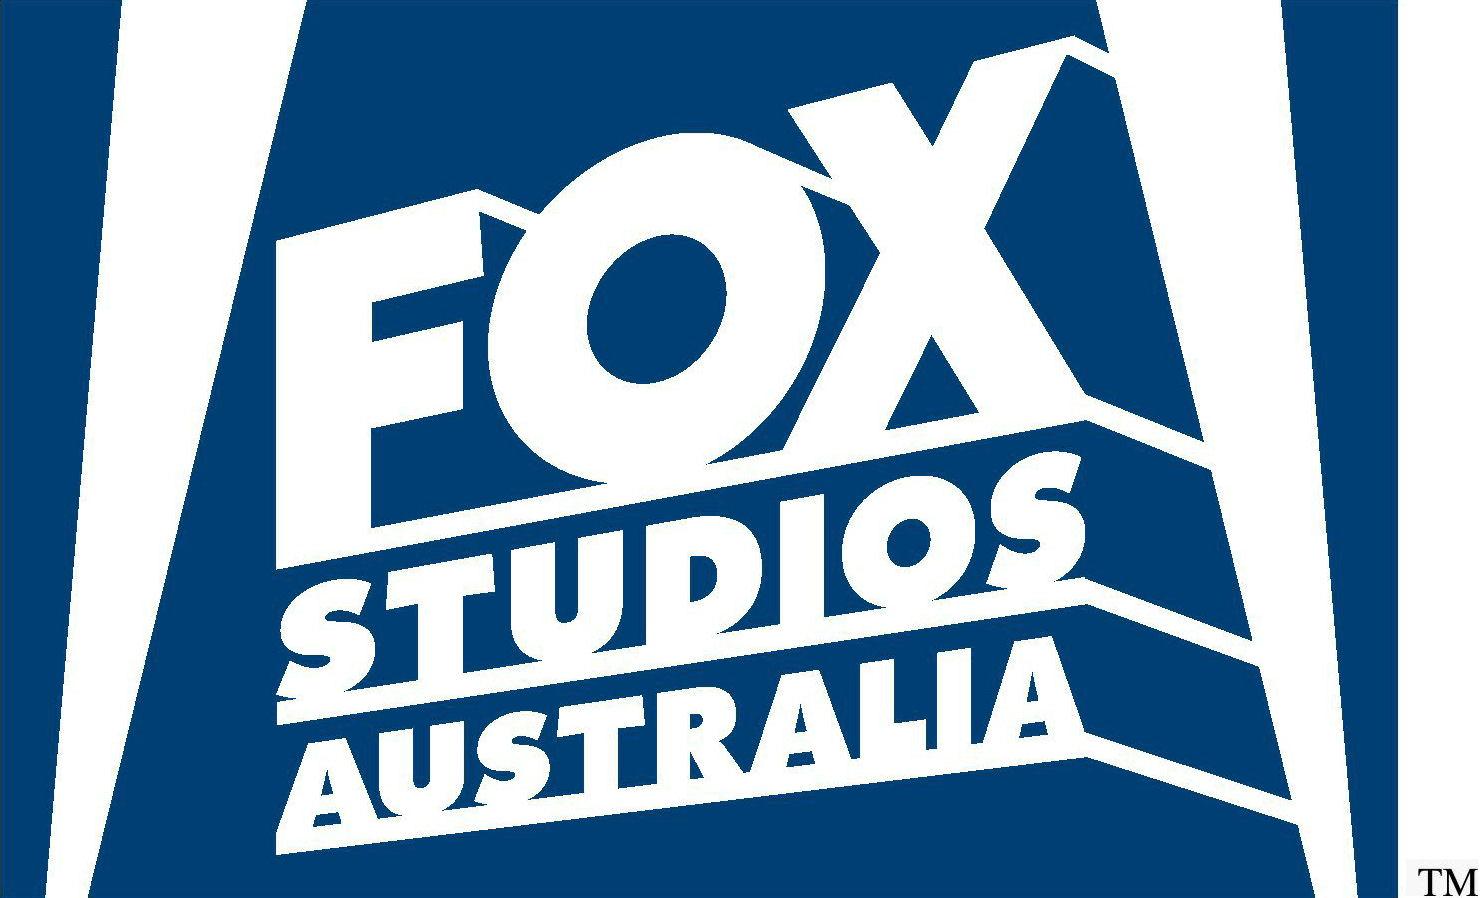 Fox studios australia ausfilm for Studio australia